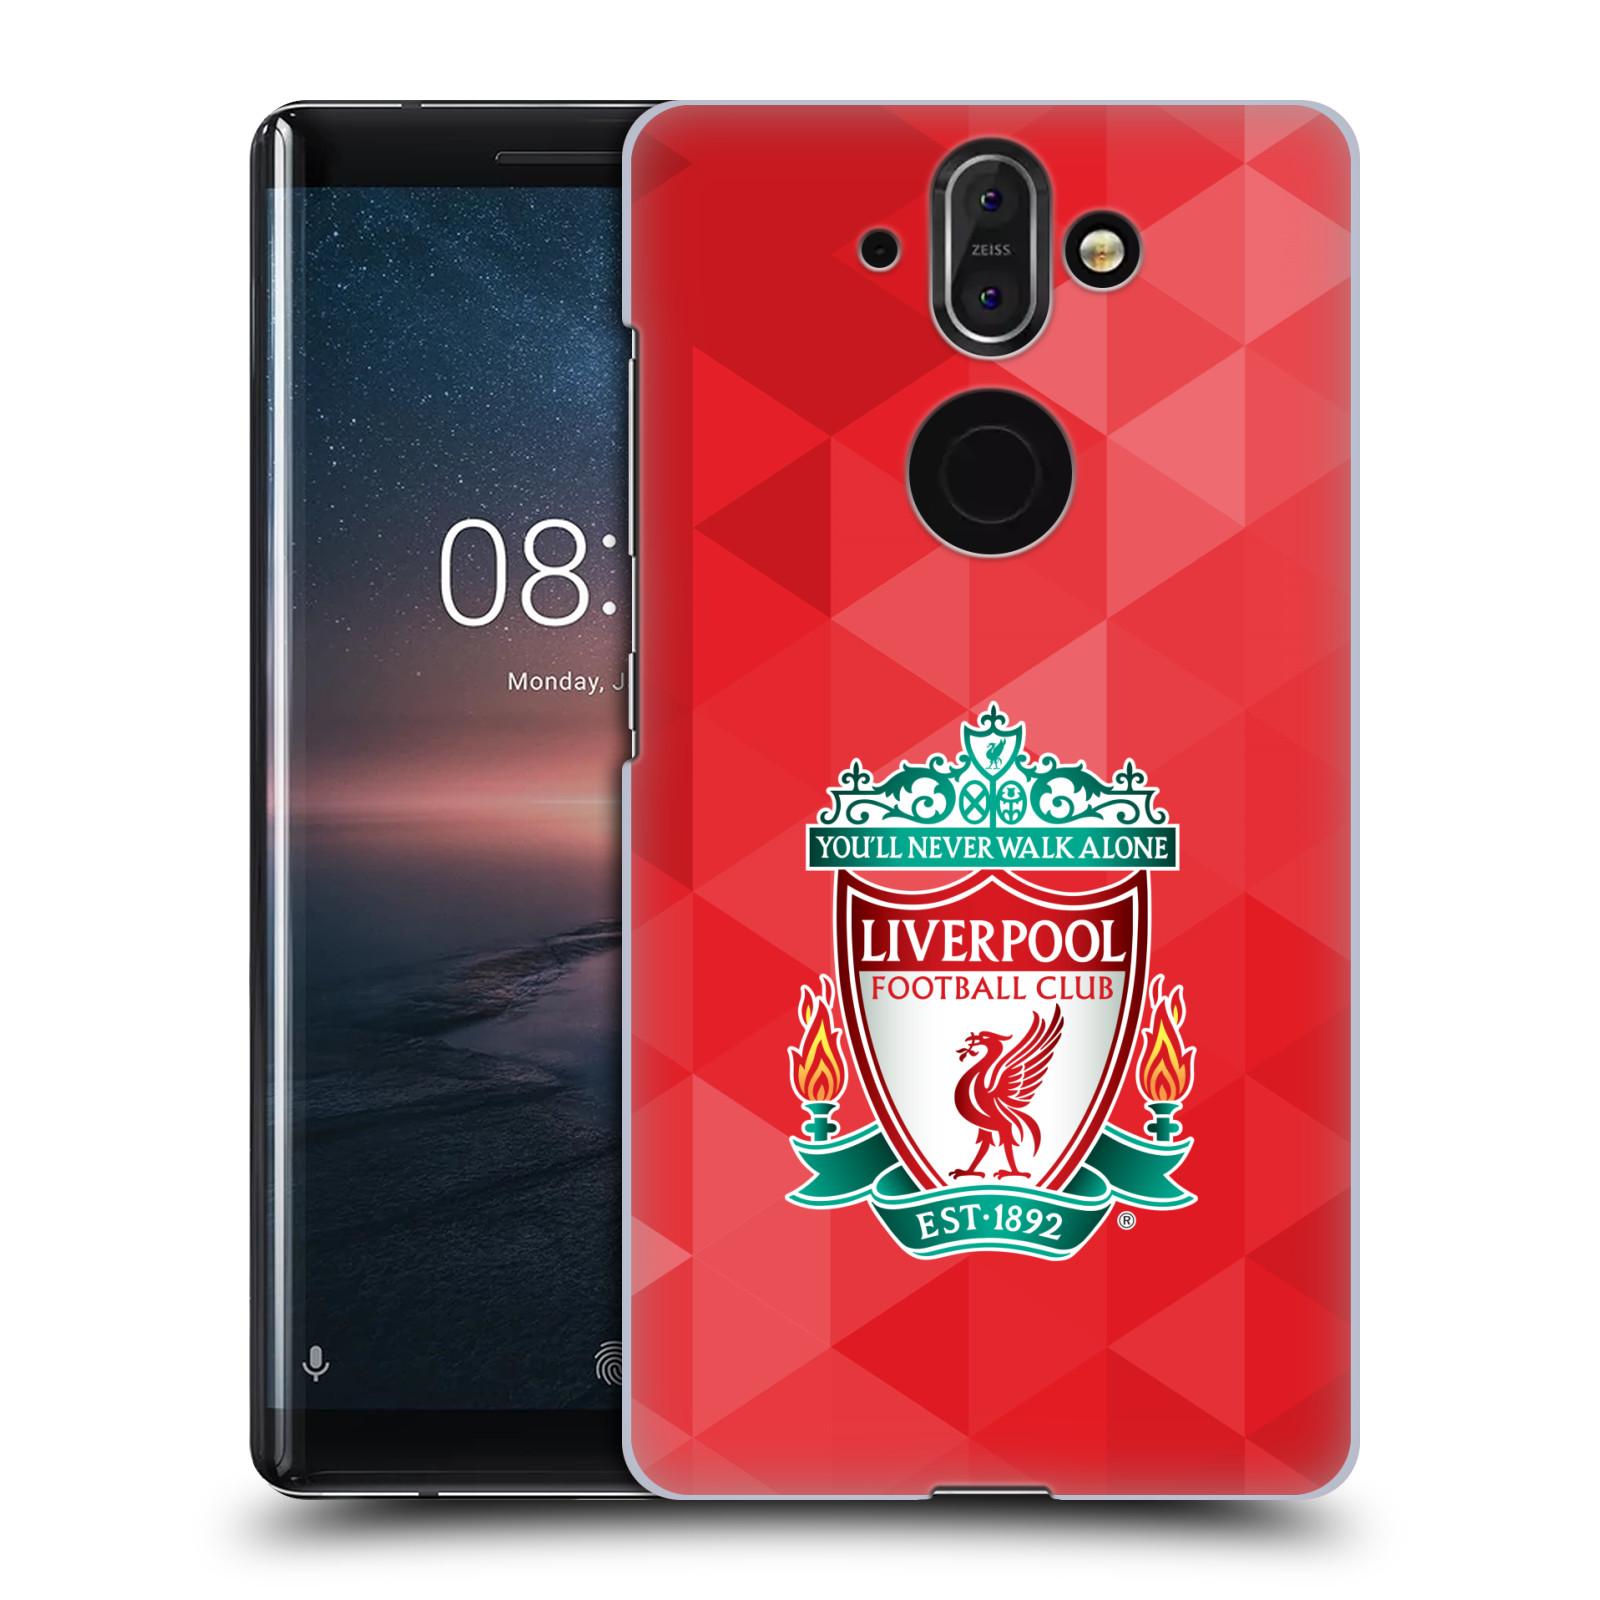 Plastové pouzdro na mobil Nokia 8 Sirocco - Head Case - ZNAK LIVERPOOL FC OFFICIAL GEOMETRIC RED